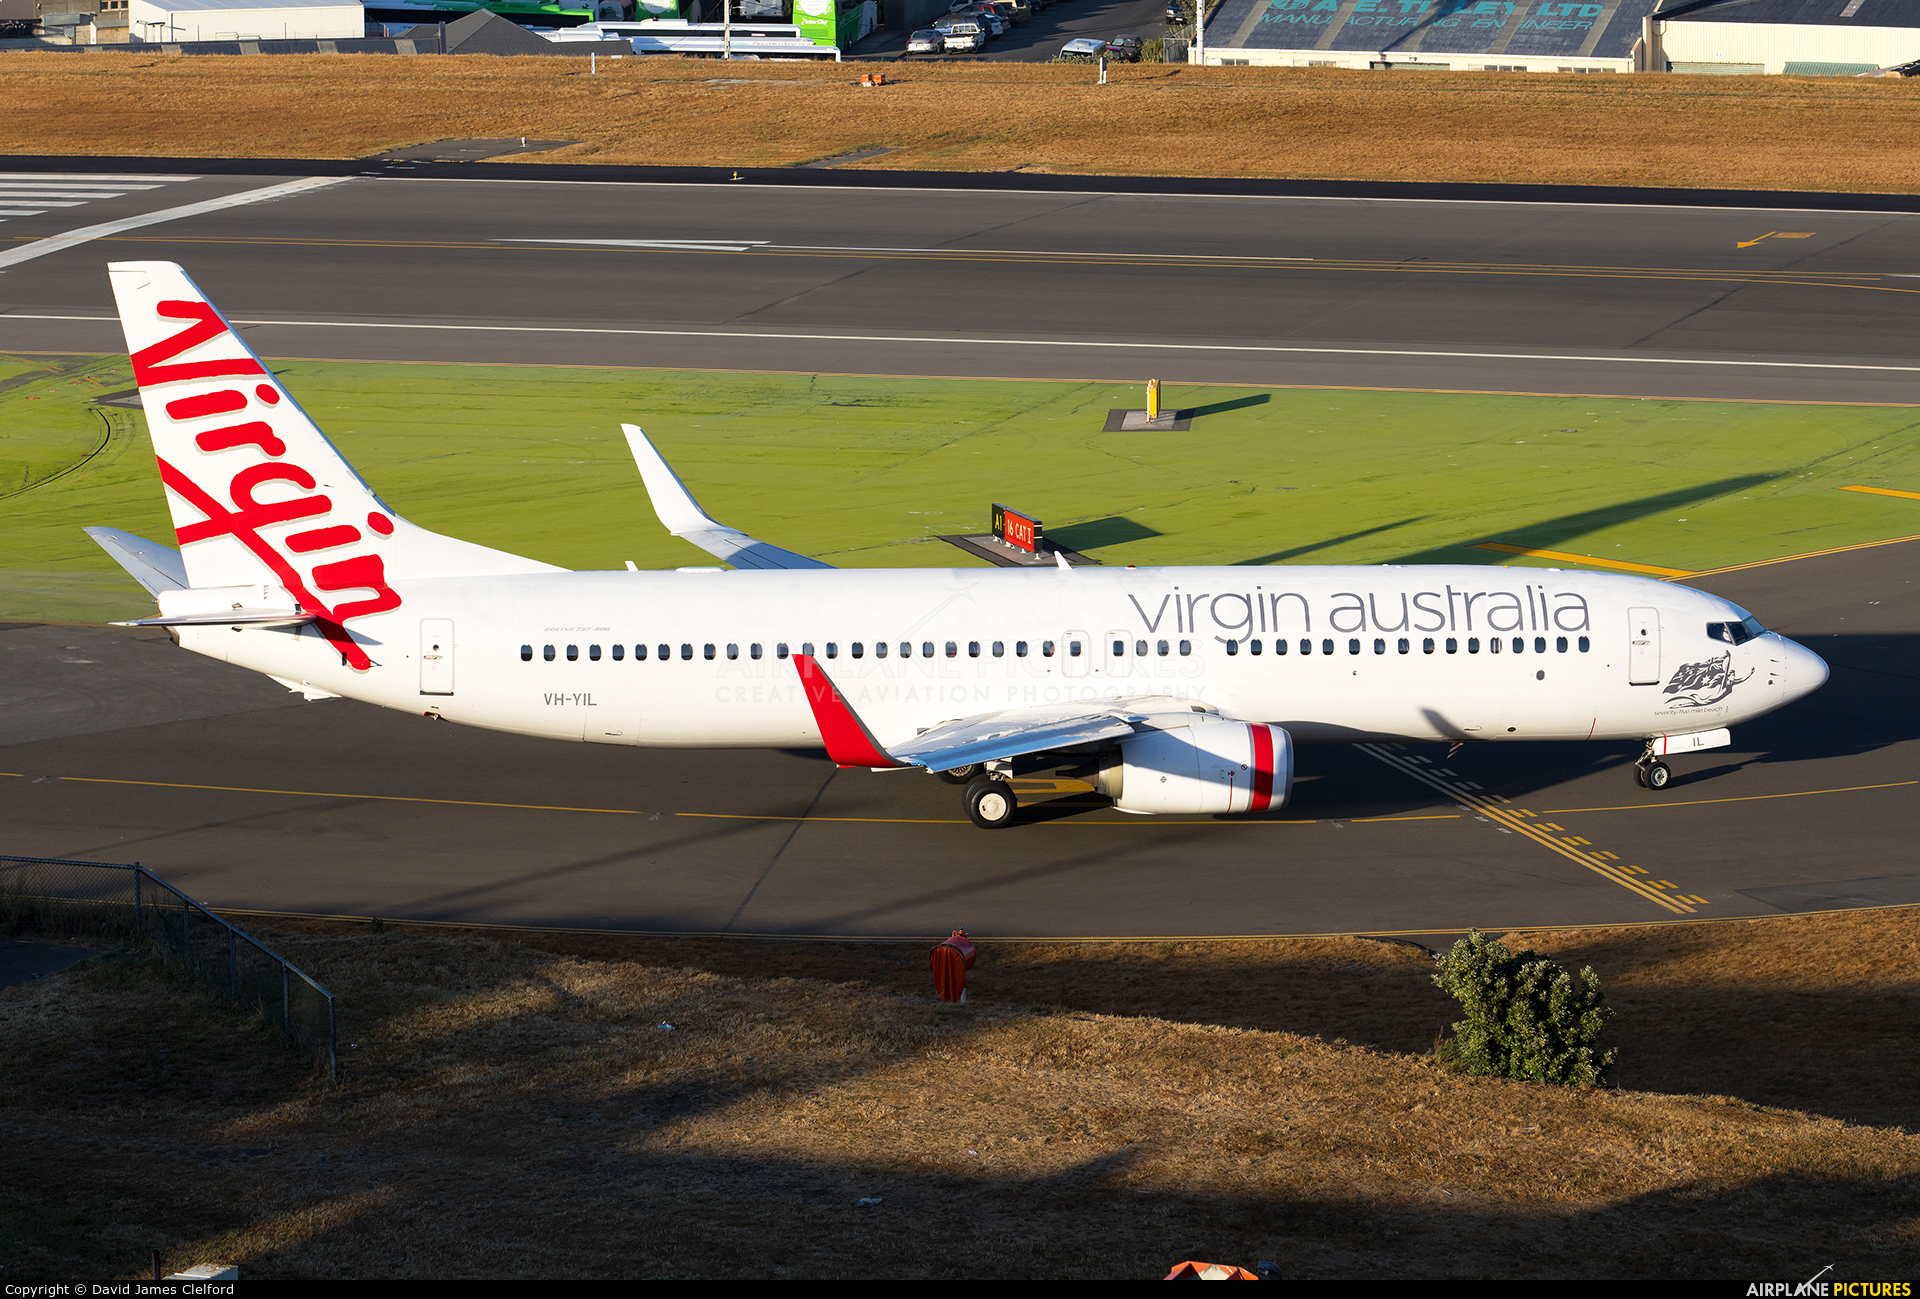 Virgin Australia VH-YIL aircraft at Wellington Intl